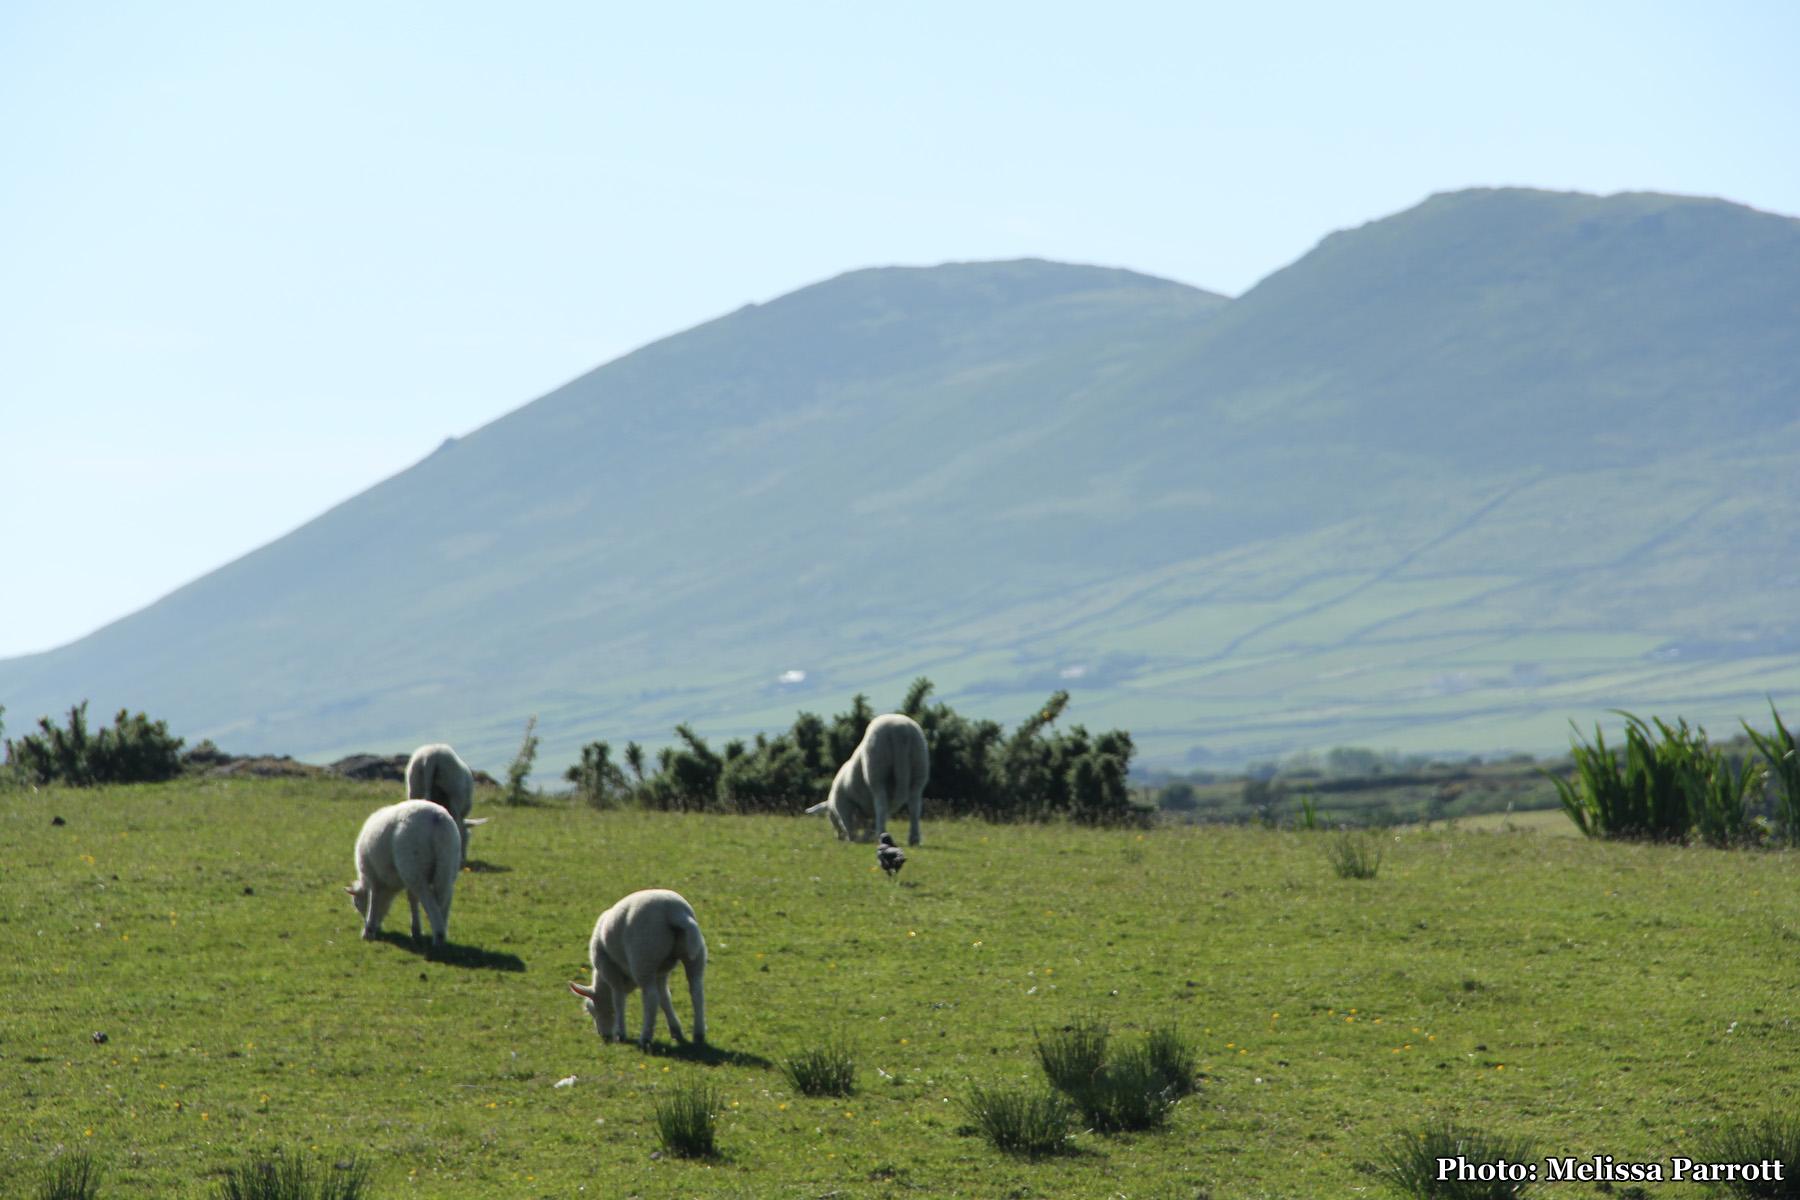 Sheep grazing near Cahersiveen